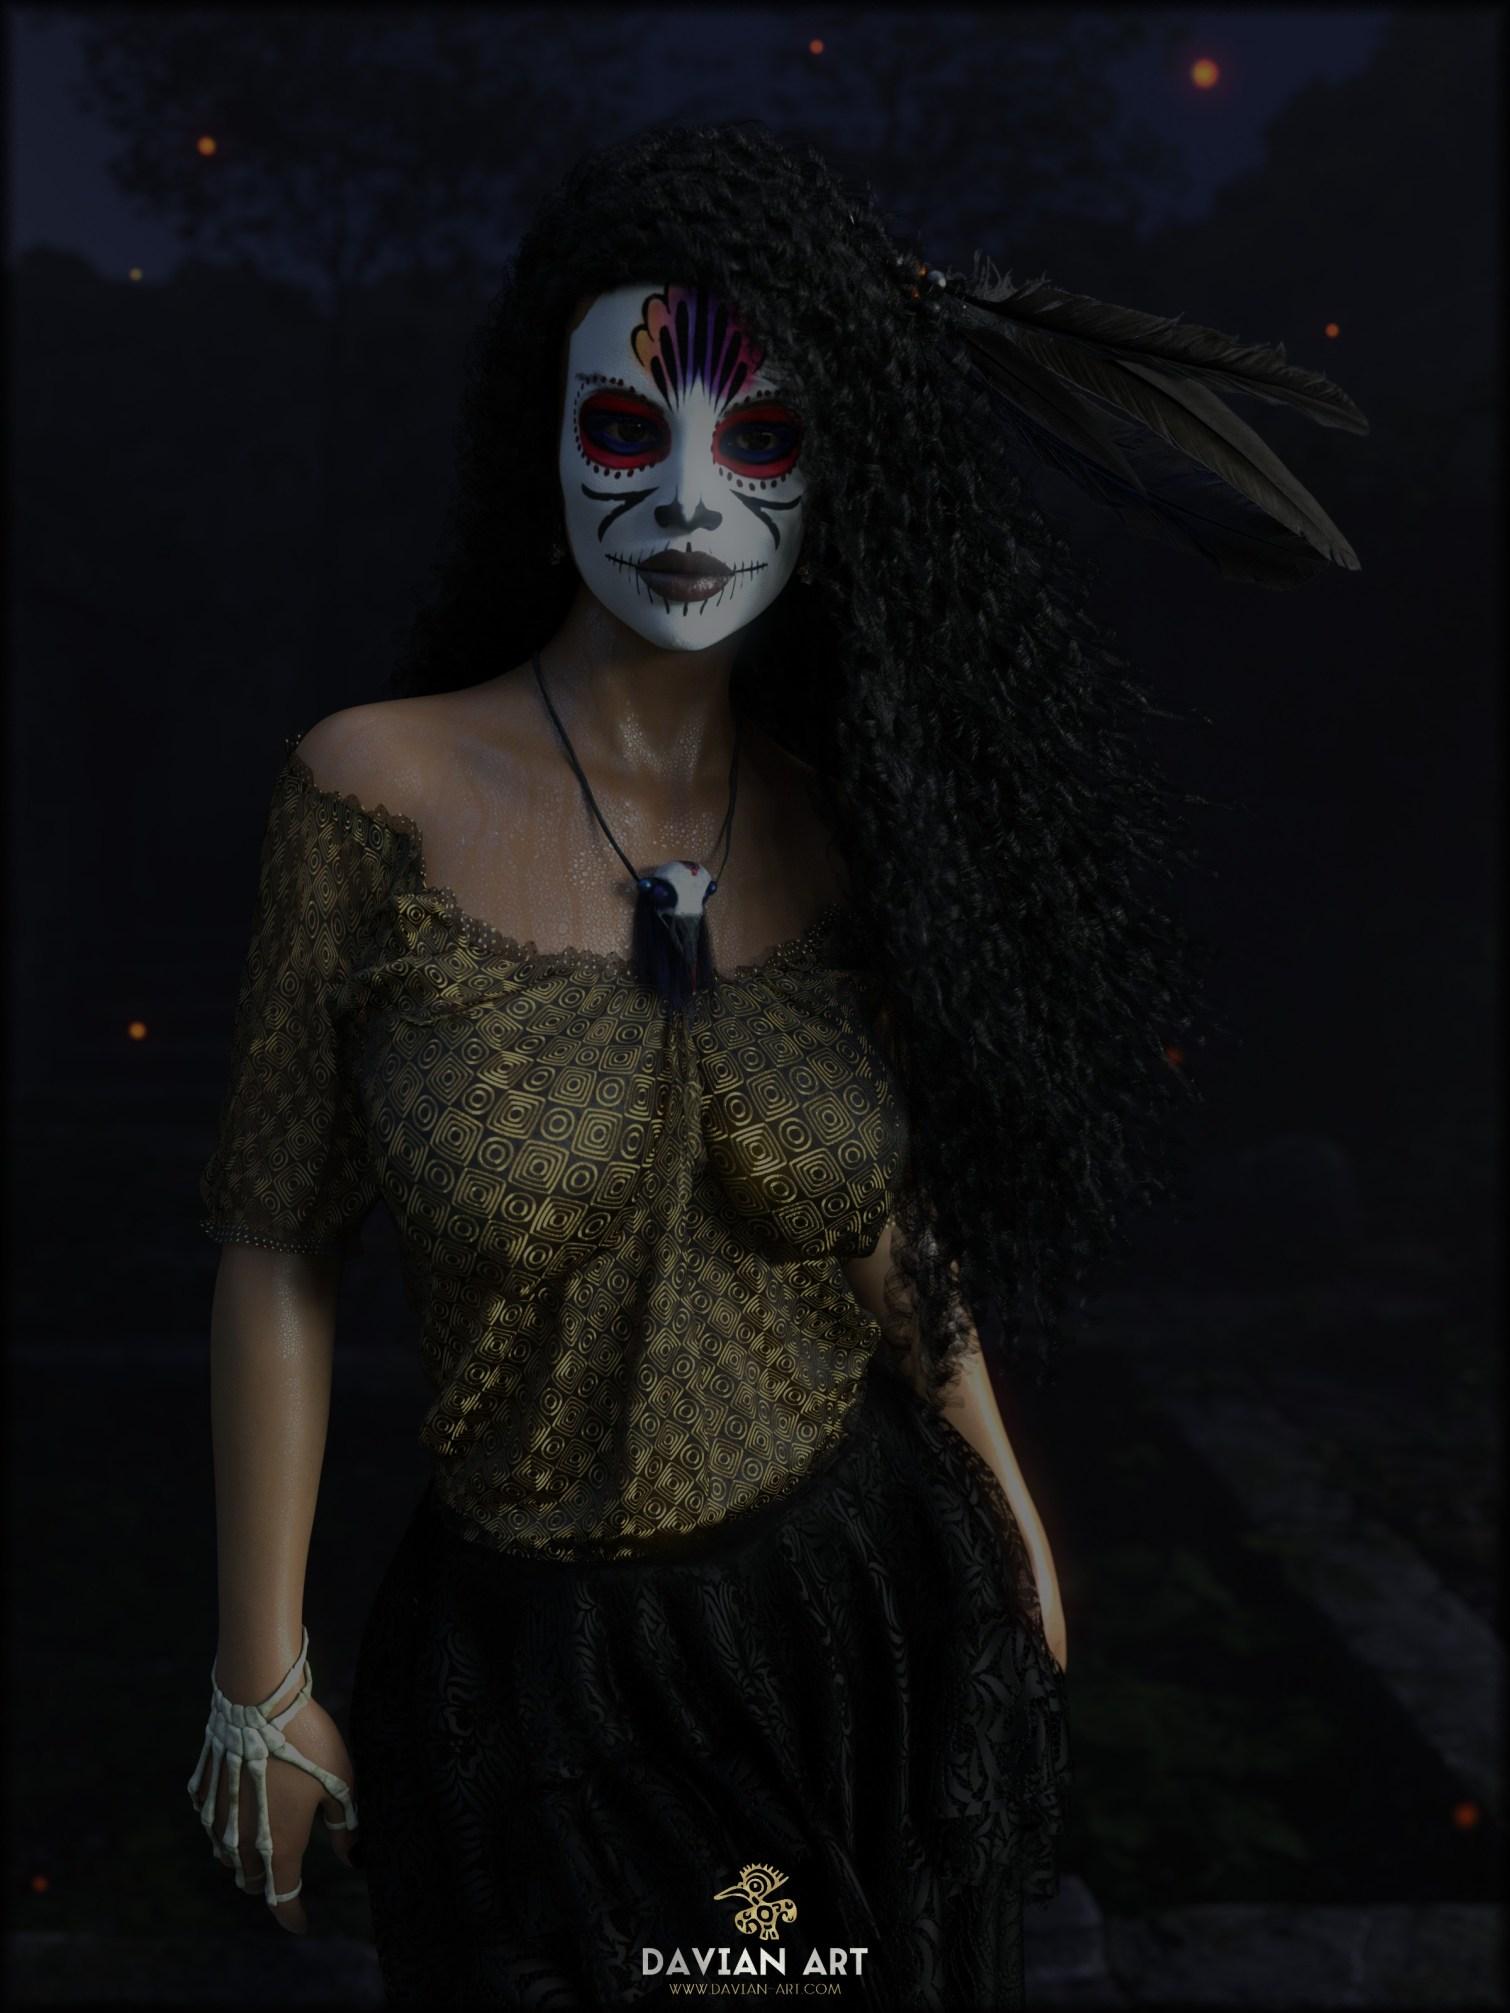 AztecMythologyByDavianArt